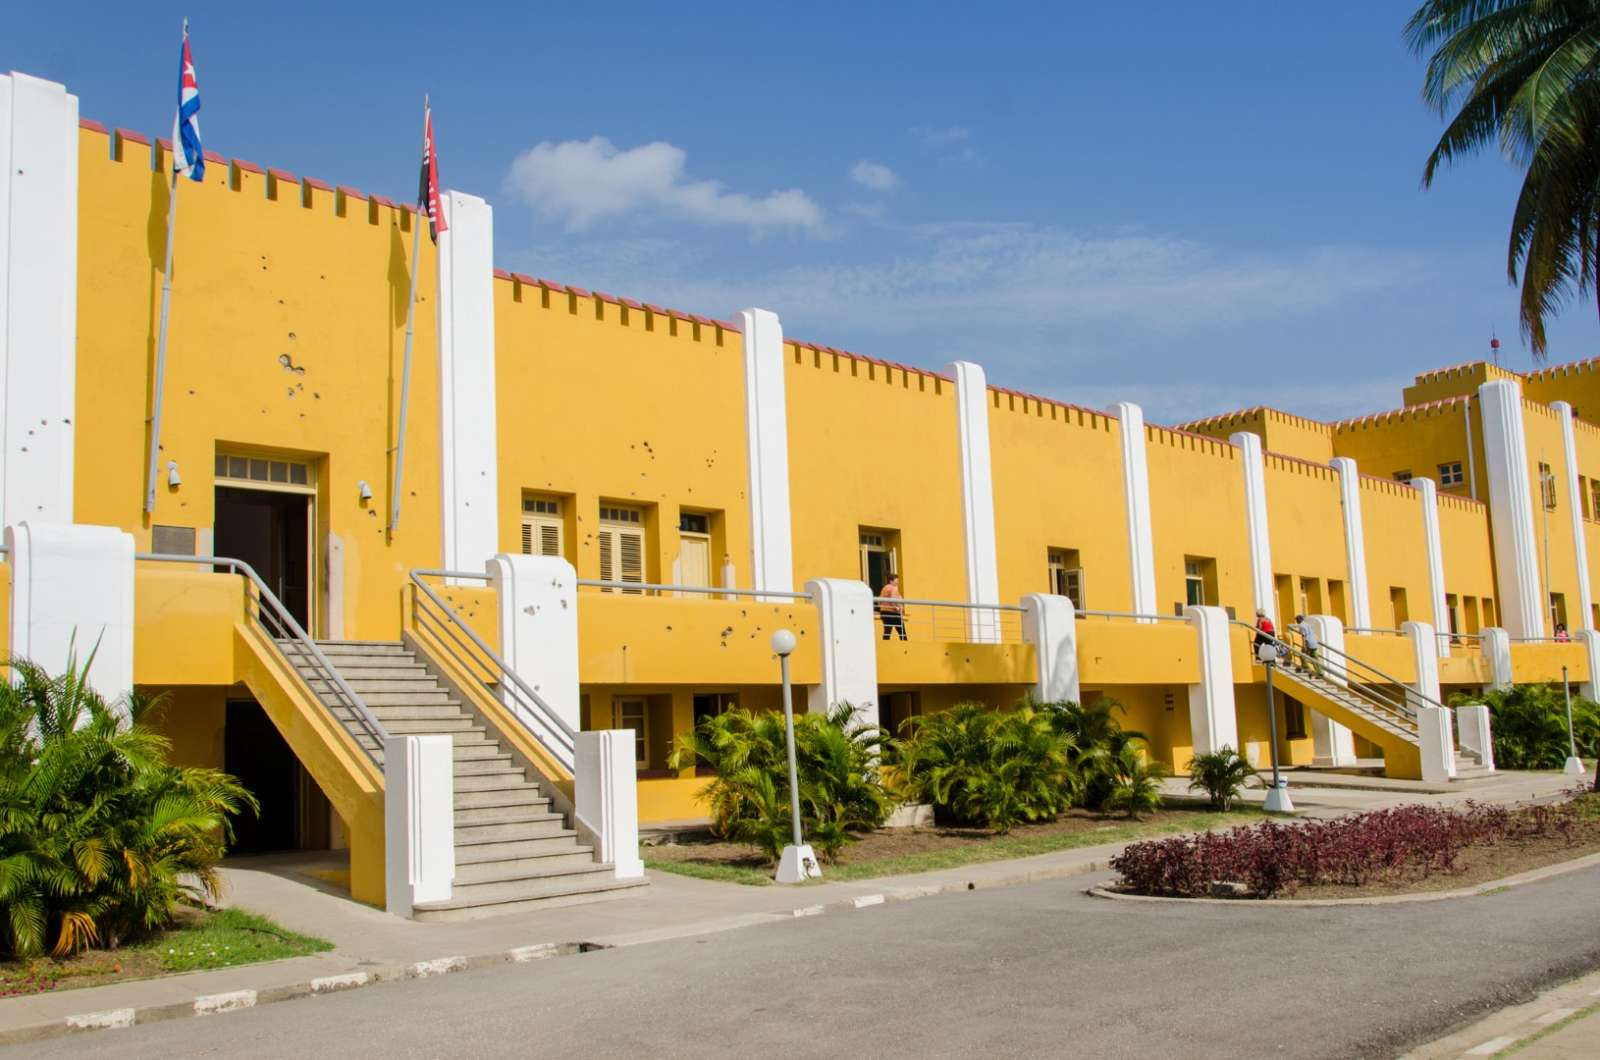 The Moncada Barracks Museum in Santiago de Cuba